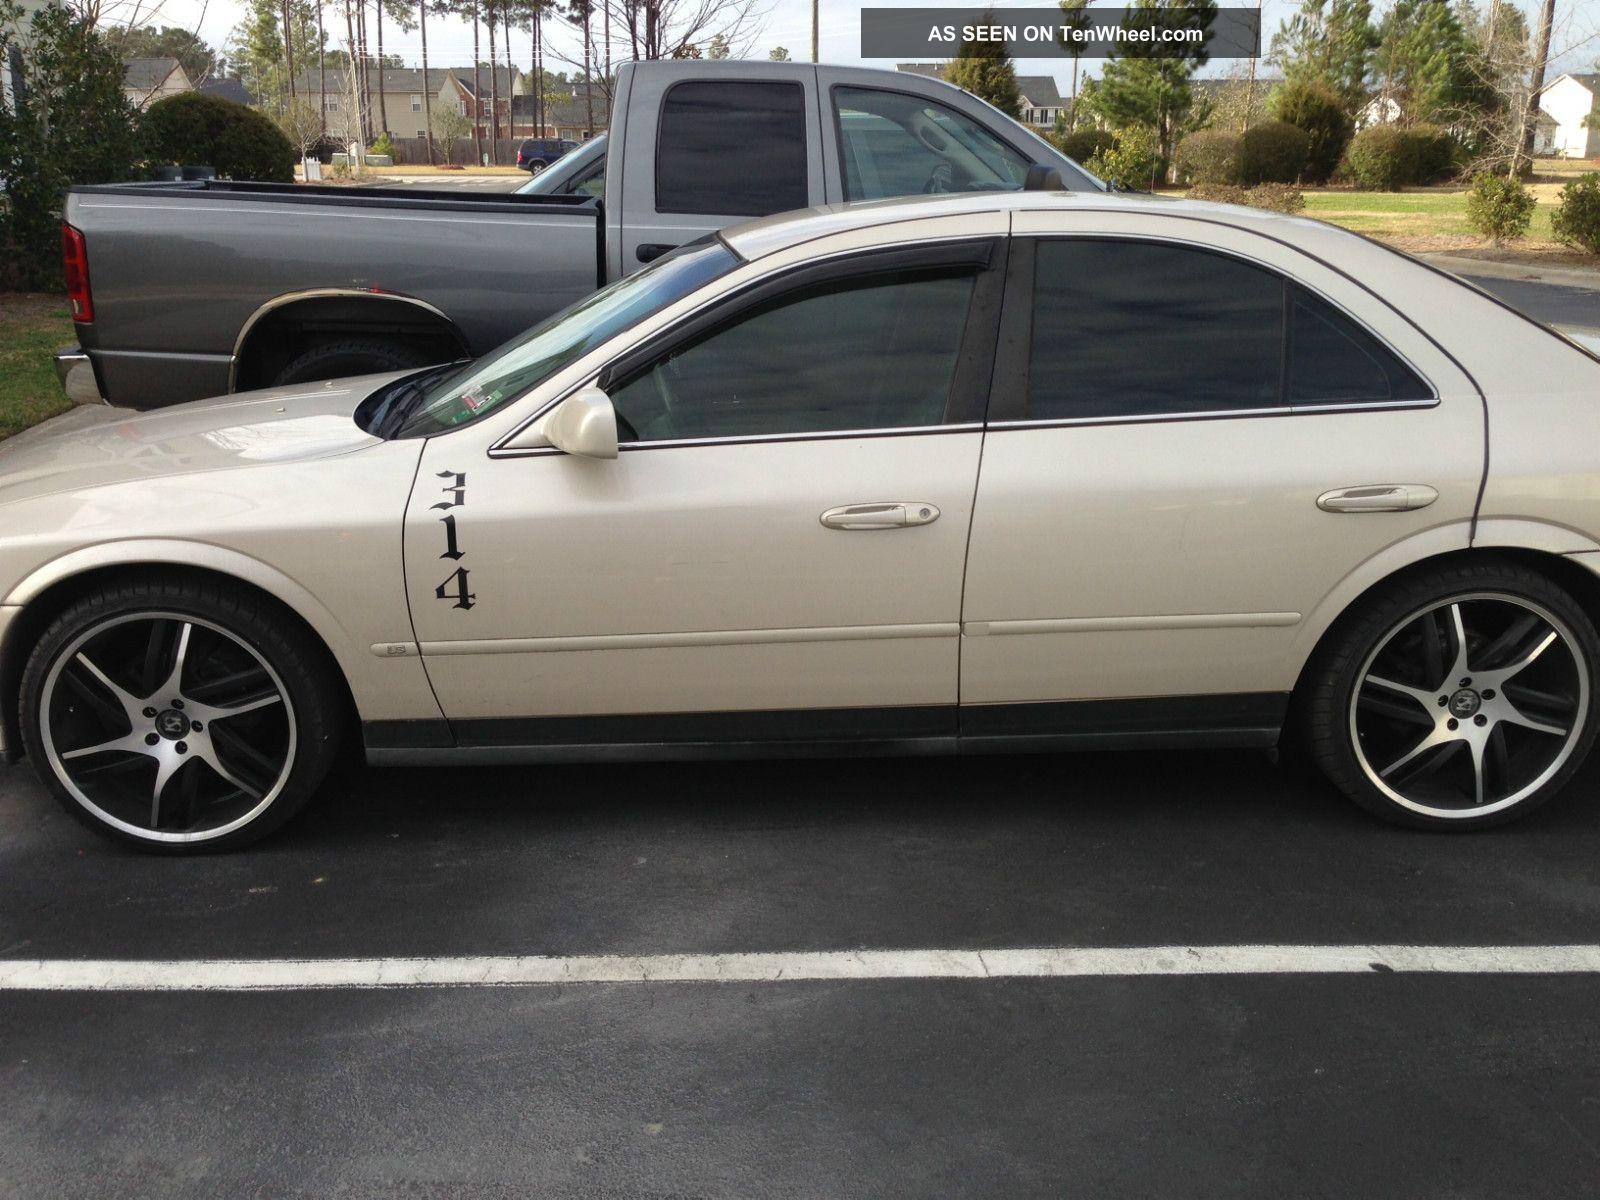 2000 Lincoln Ls V6,  20